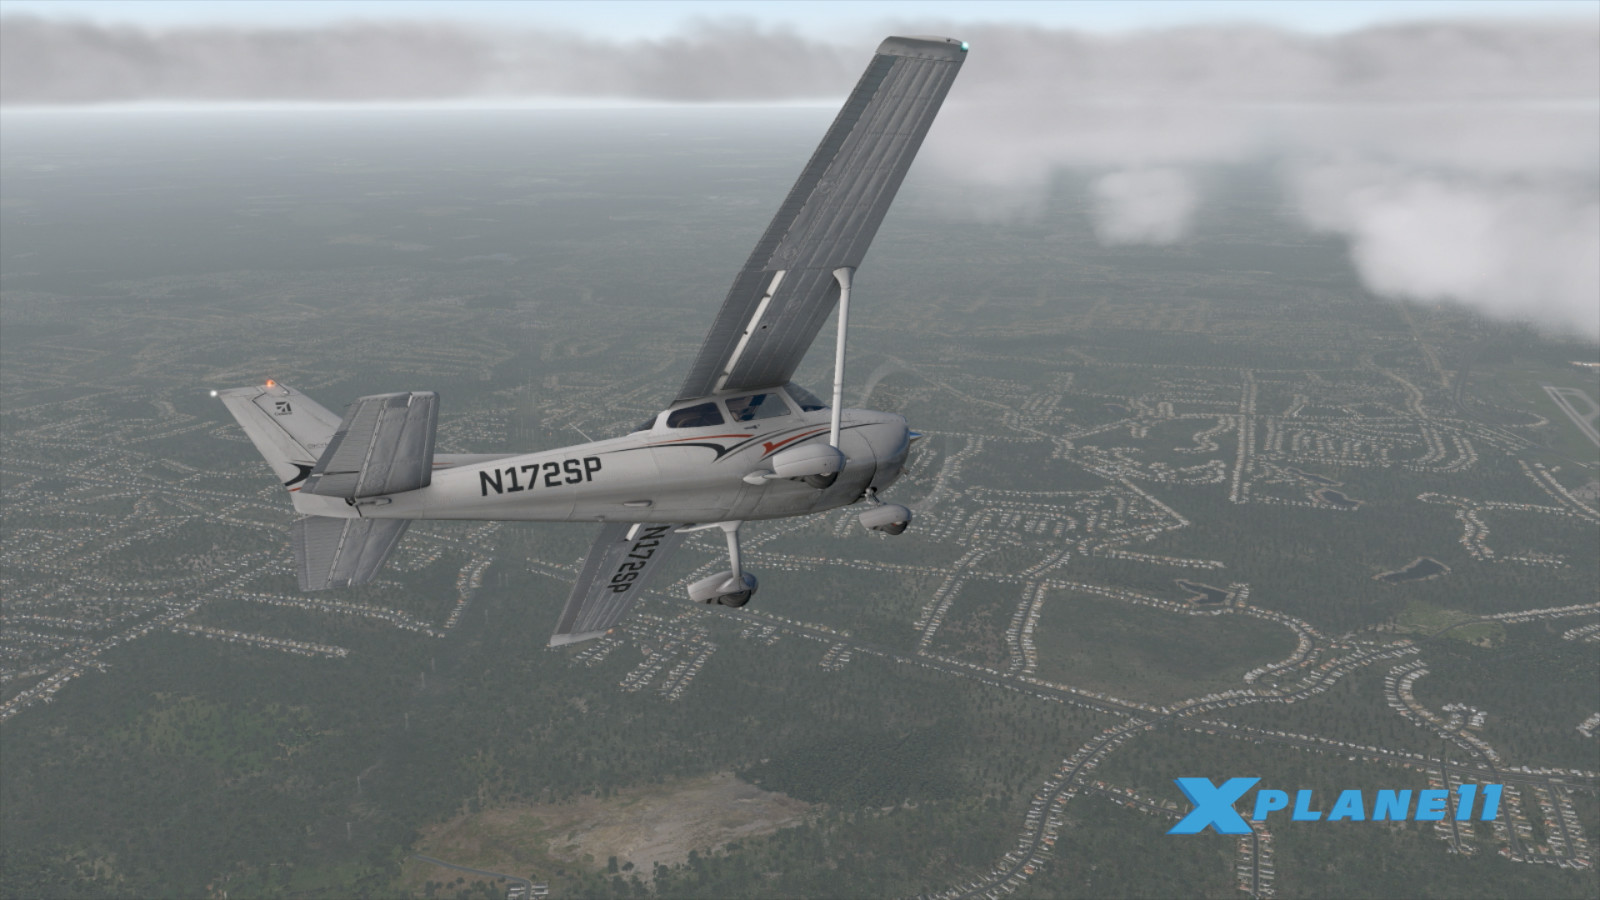 X-Plane 11 ESPAÑOL PC Full + Global Scenery DLC (CODEX) + REPACK 13 DVD5 (JPW) 1